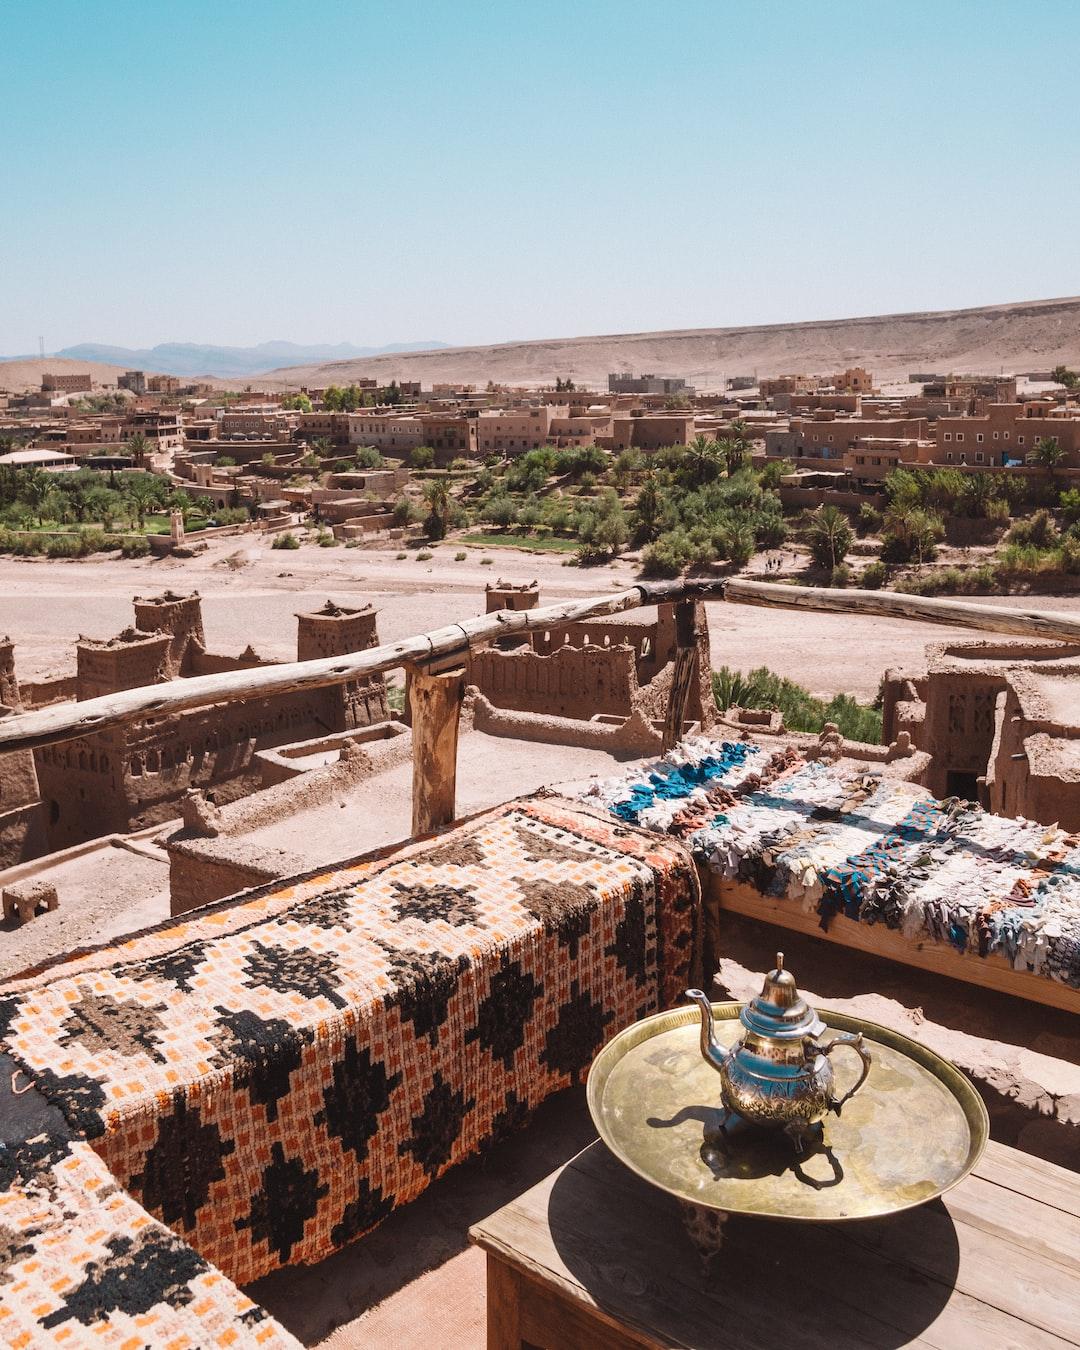 Ait benhaddou in Morocco